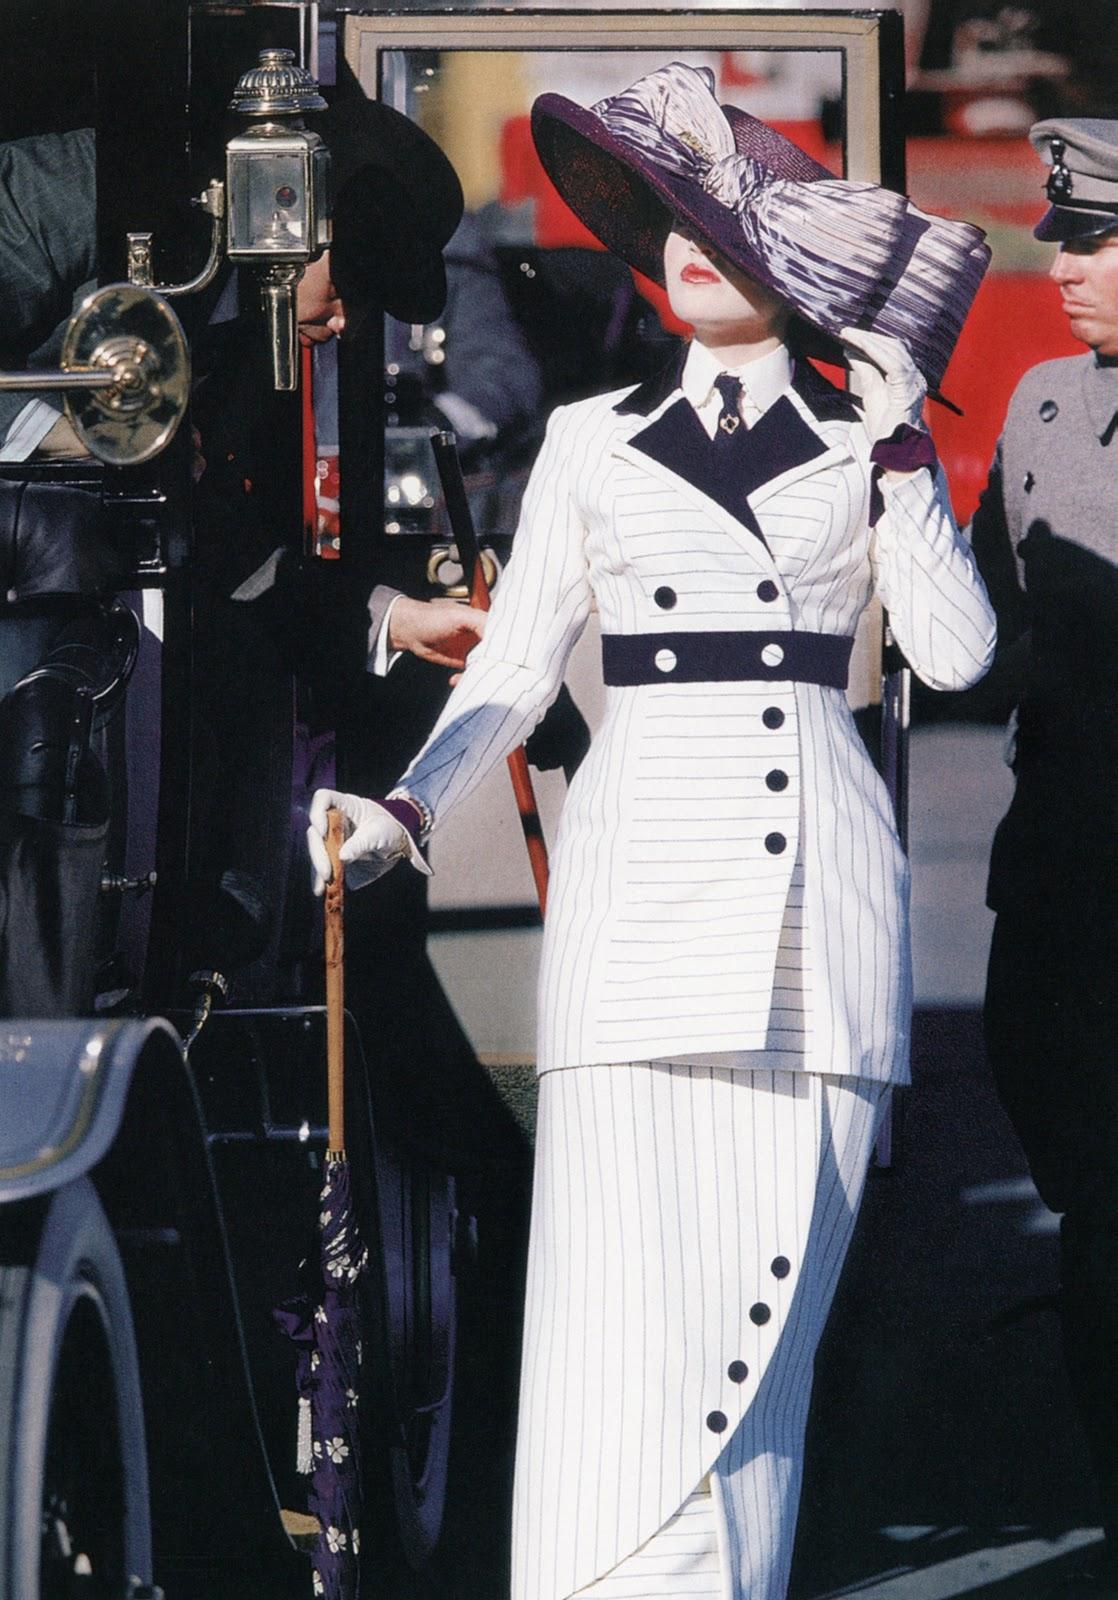 http://3.bp.blogspot.com/-2G4Gnmfhf-w/UNmbedzVyjI/AAAAAAAAsYU/QOIRp4nETo4/s1600/7._Kate_Winslet_Titanic.JPG